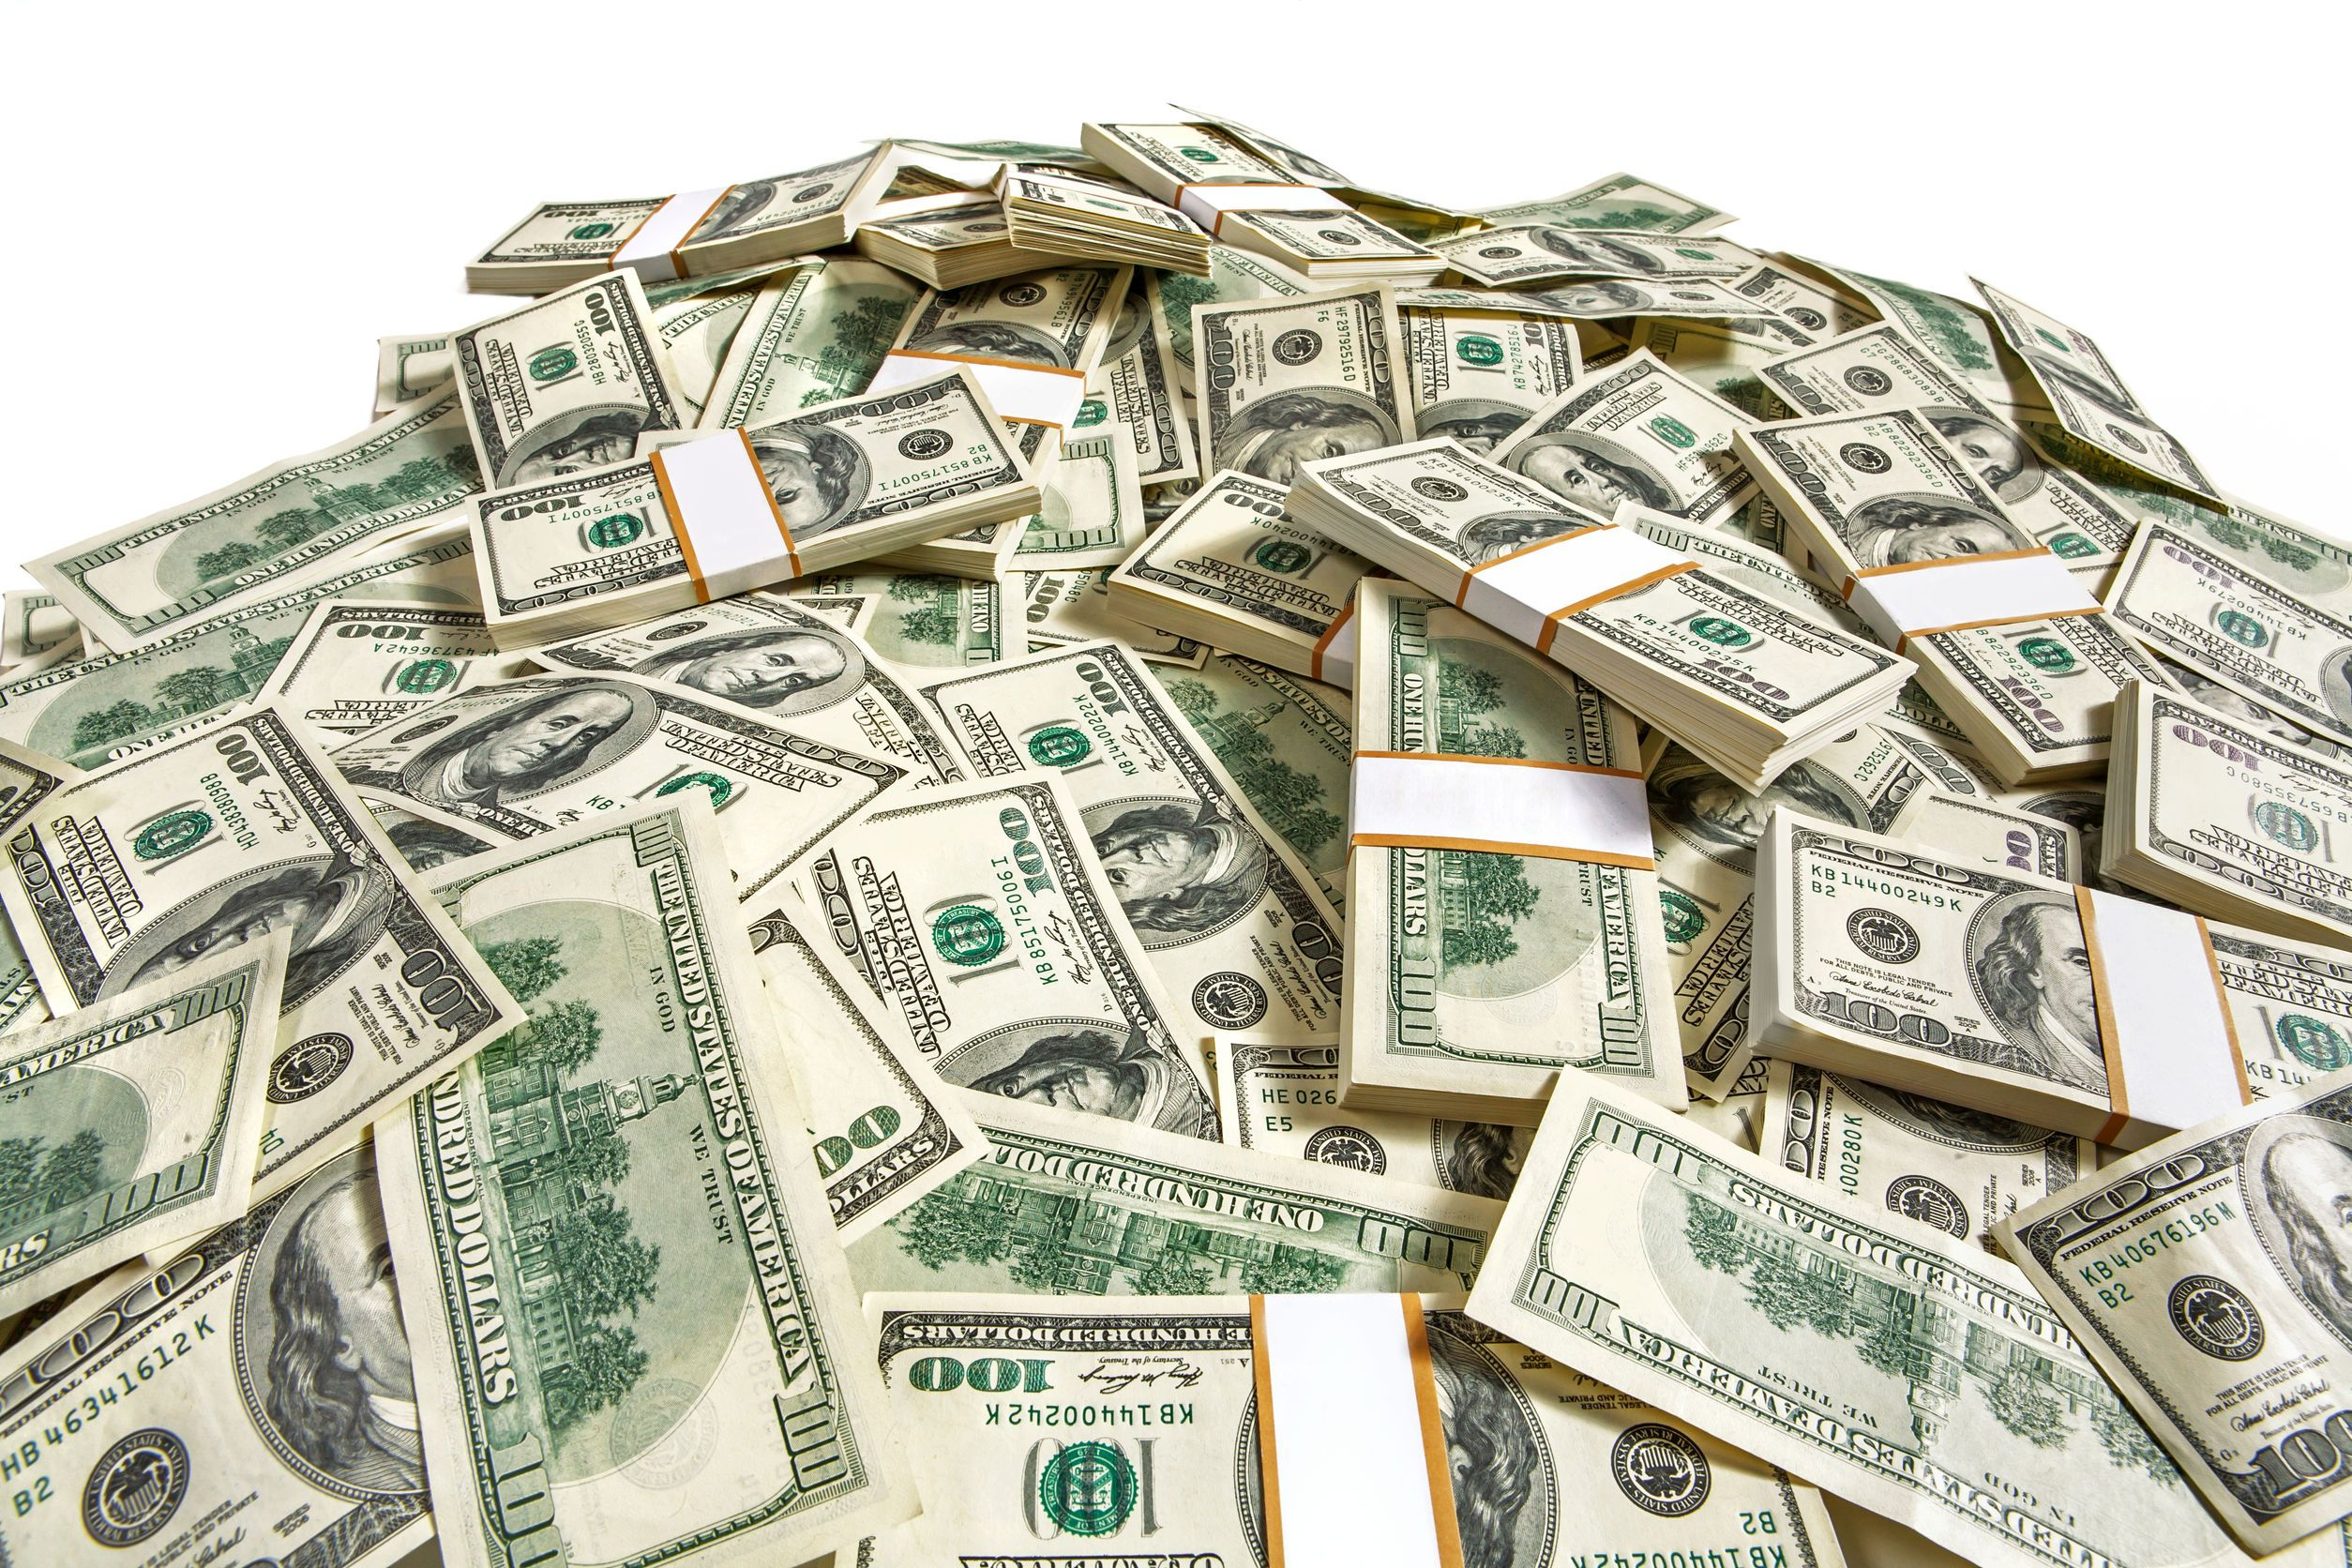 , Marijuana real estate company files for $100 million raise